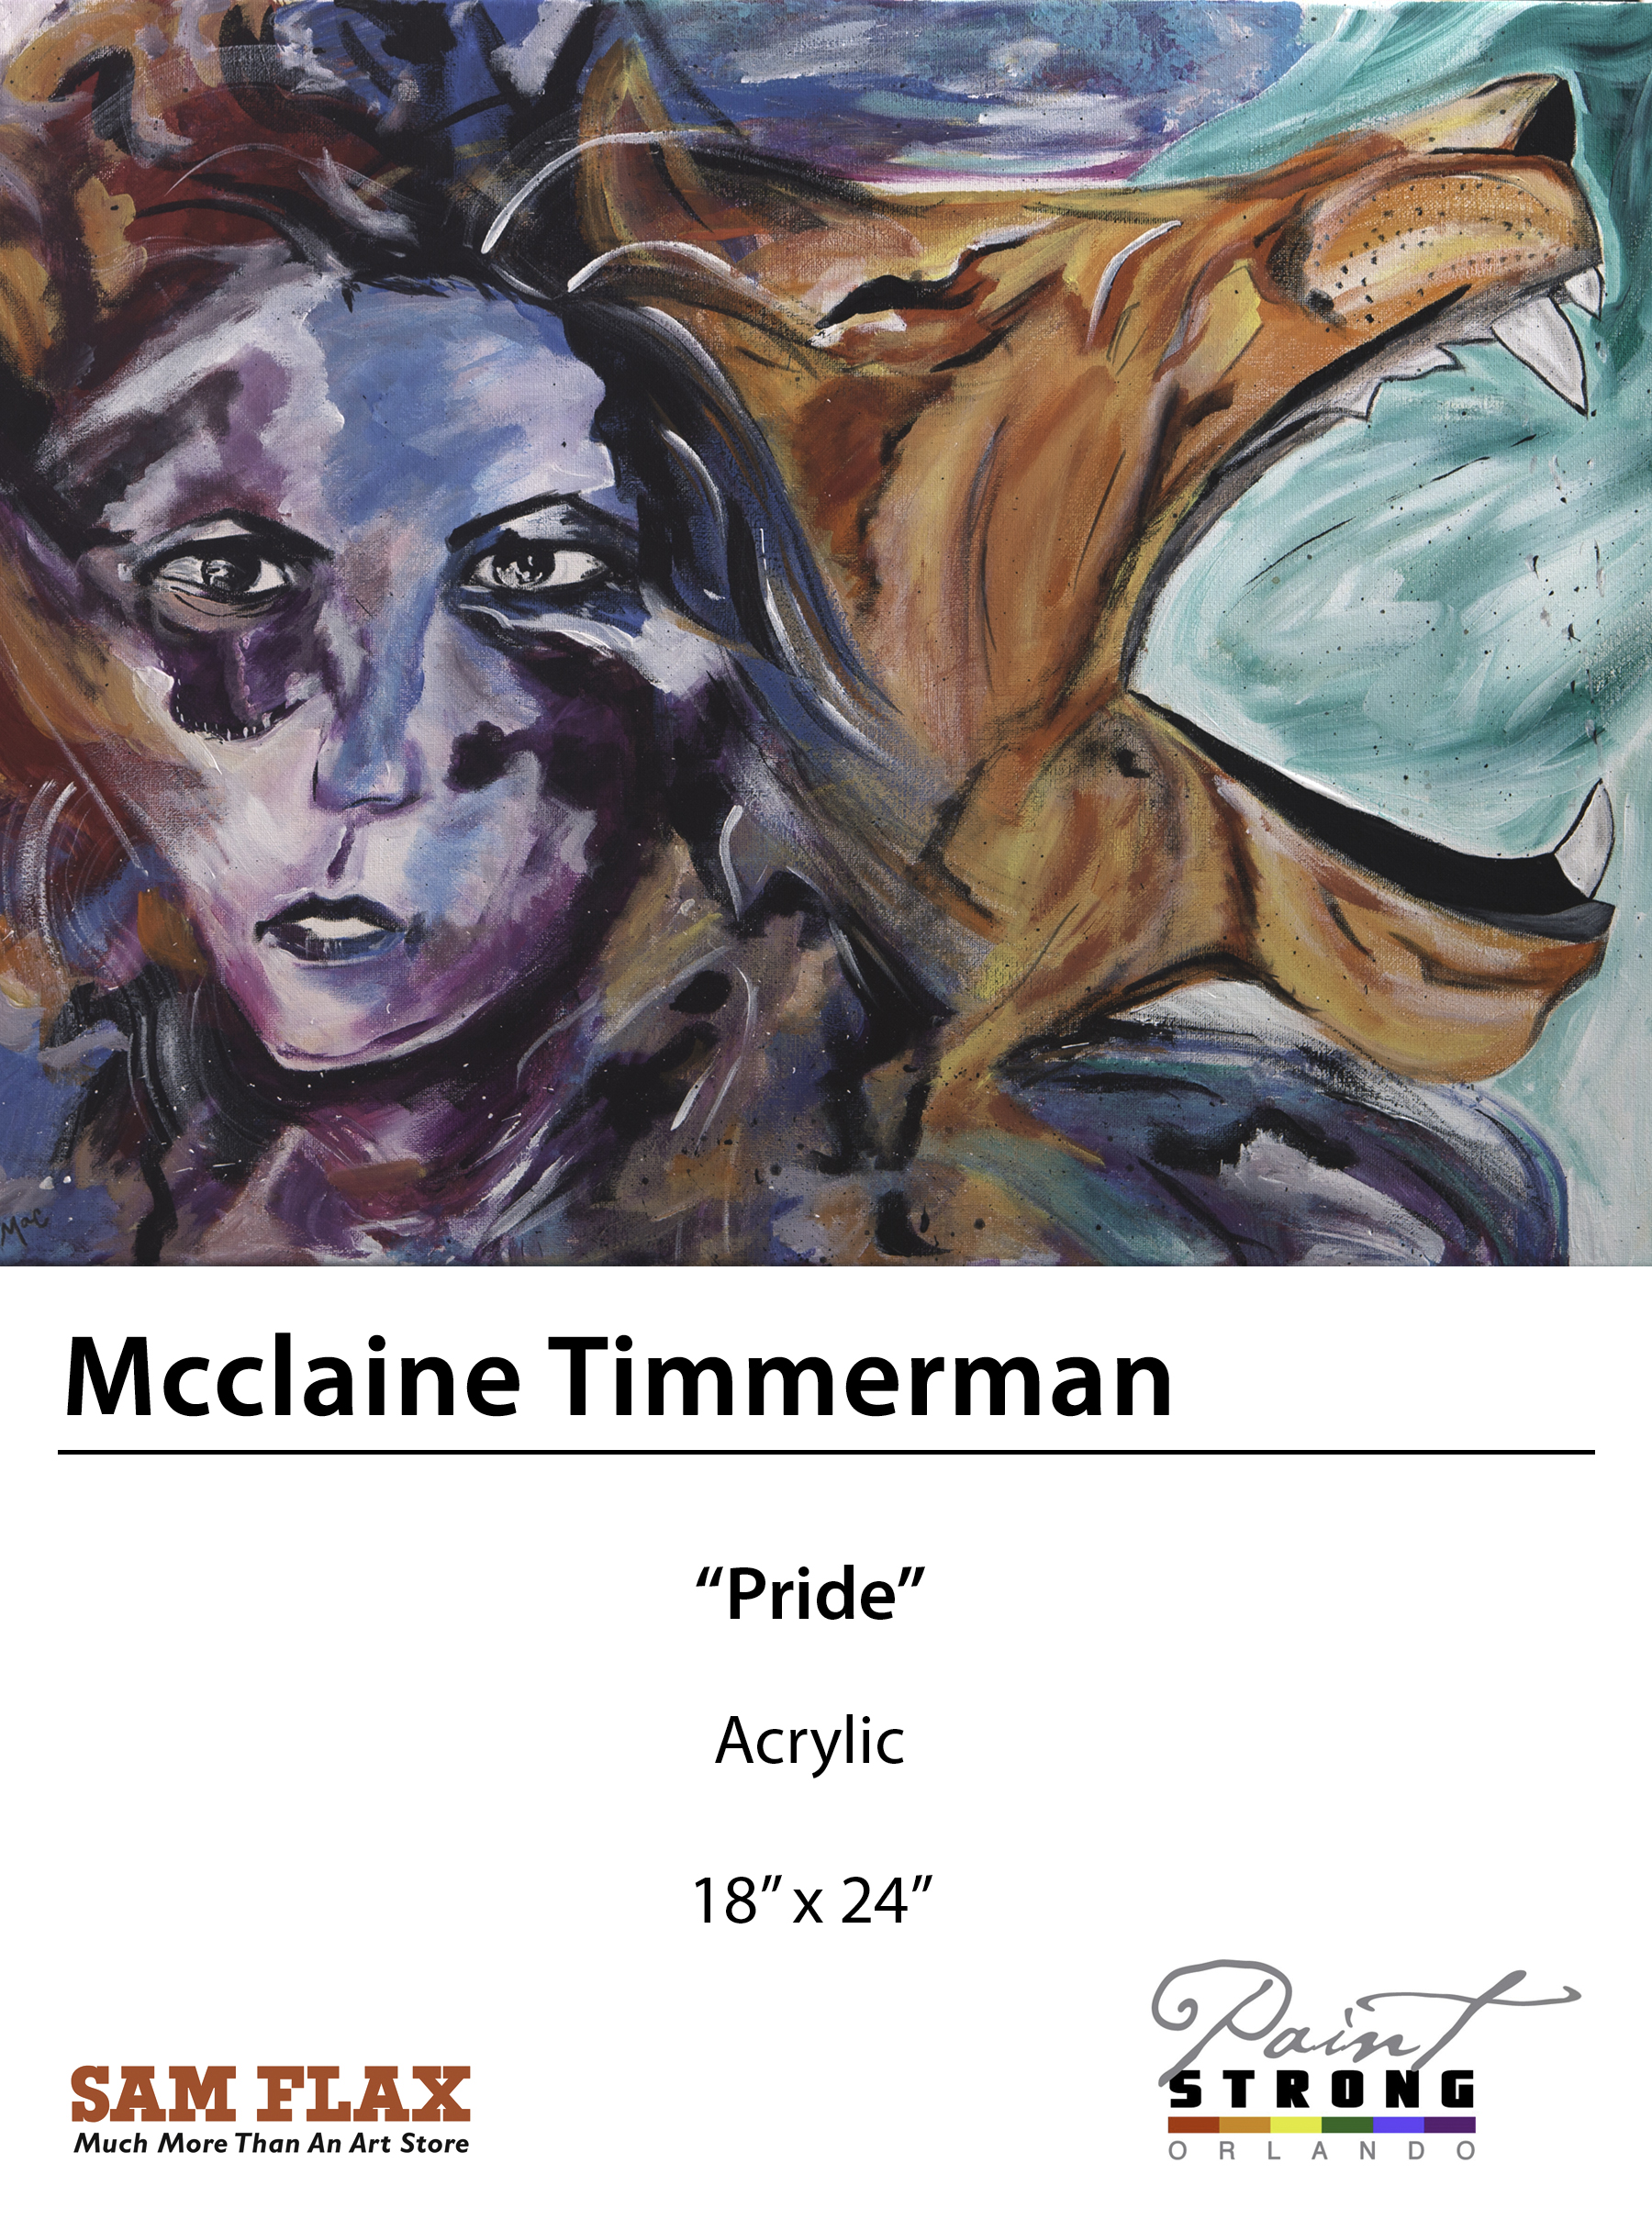 Mcclaine Timmerman